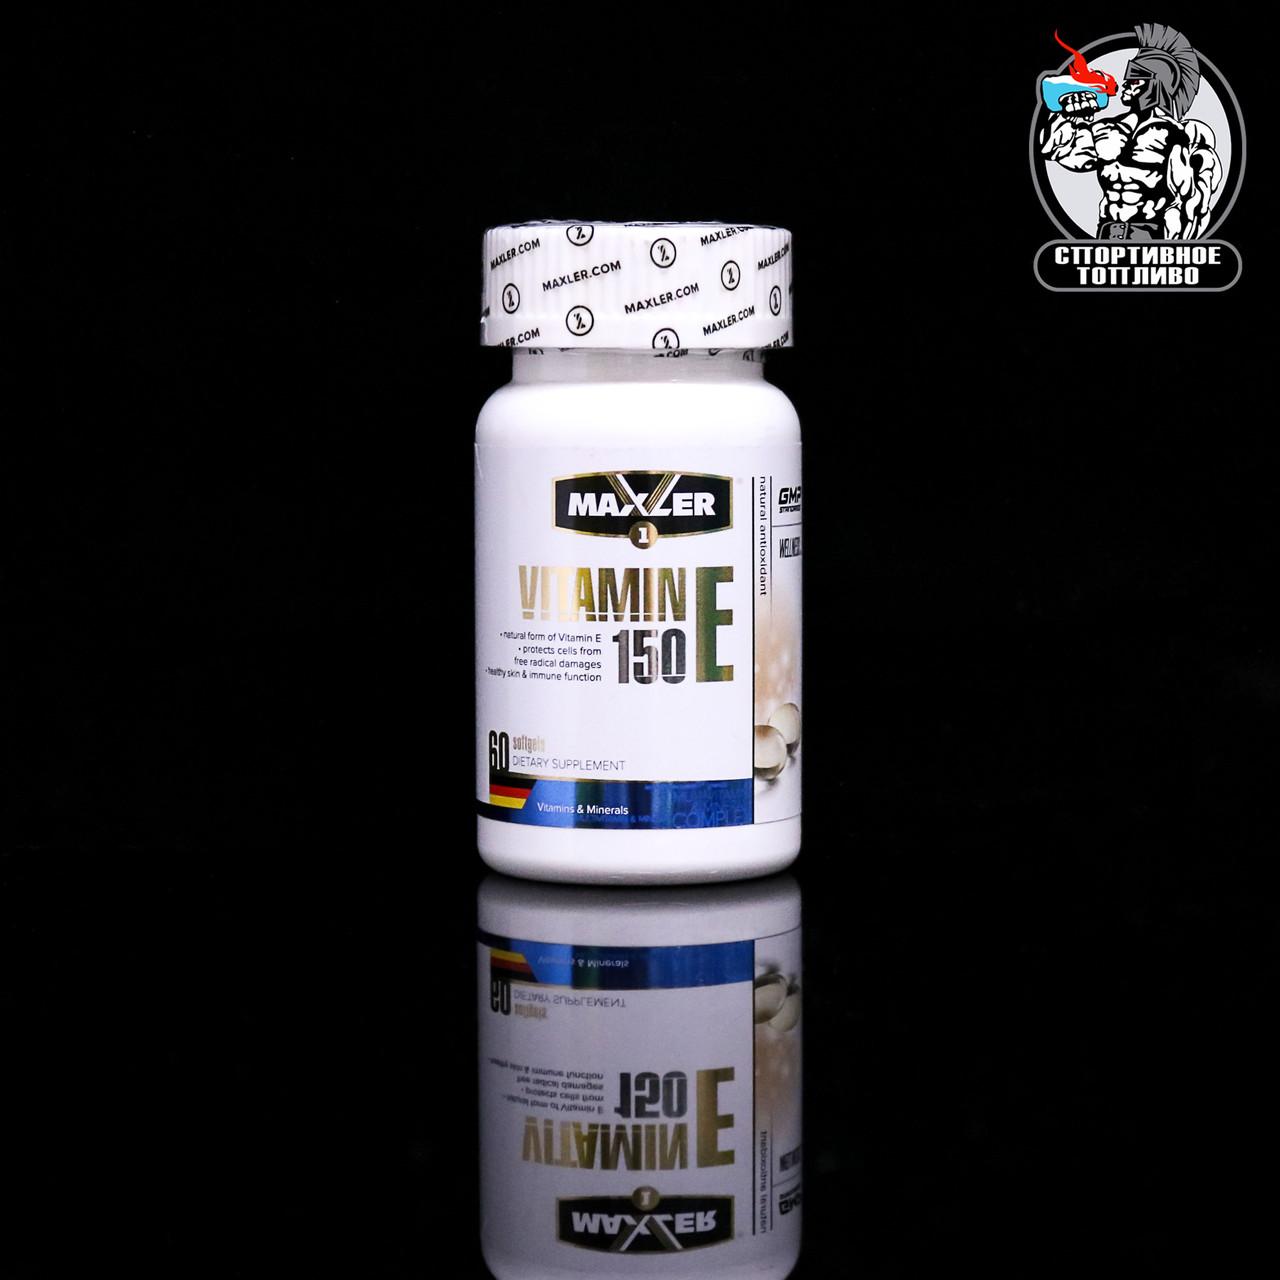 Maxler - Vitamin E 150mg 60капс/60порций